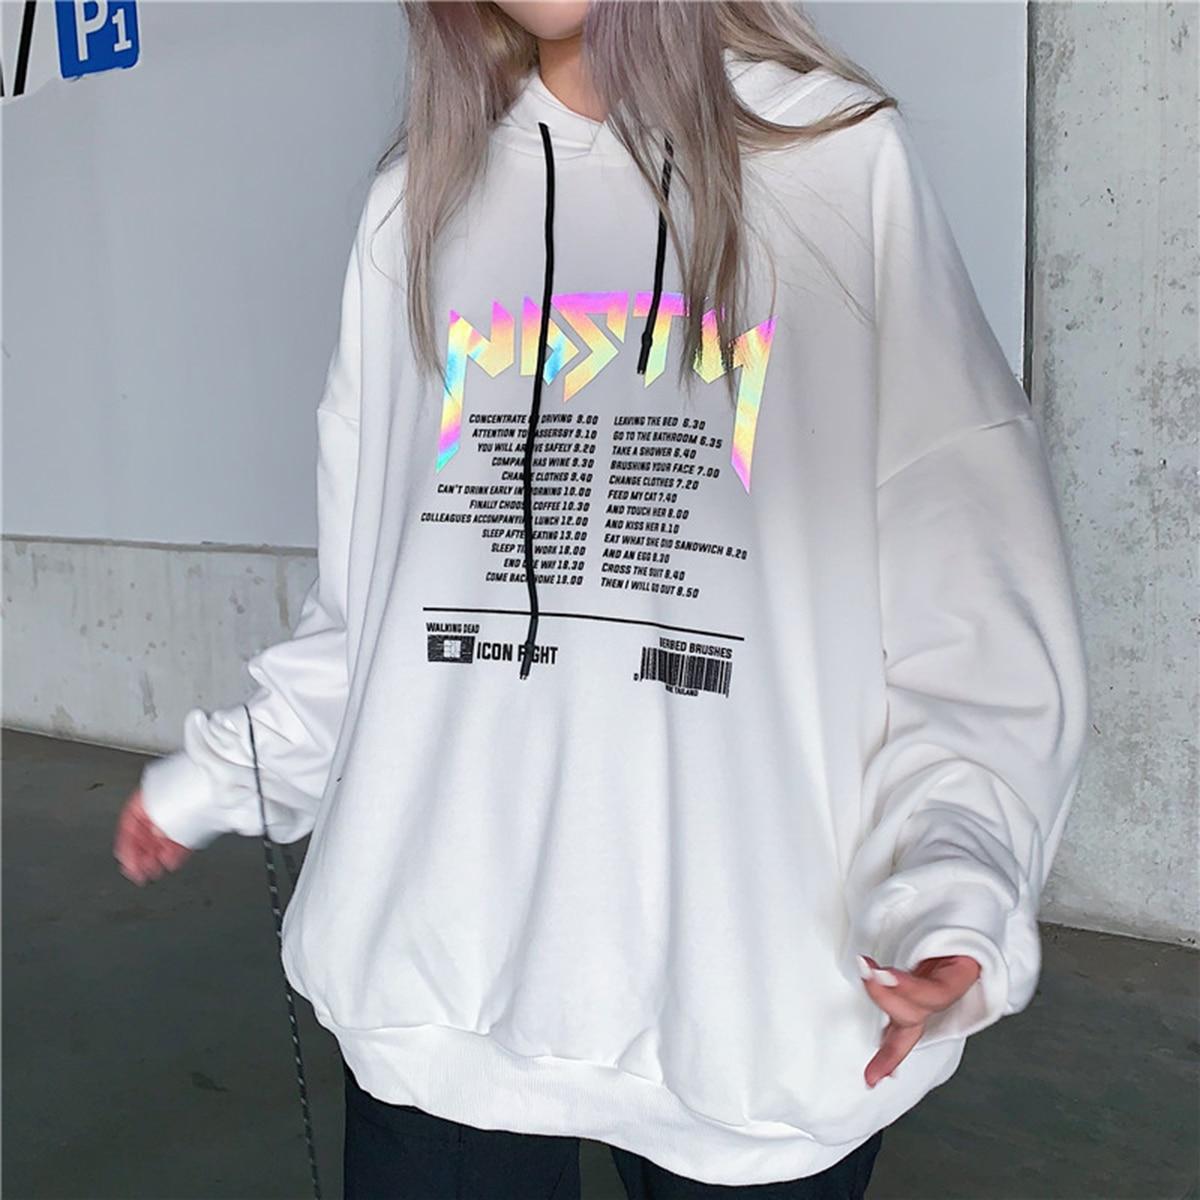 Reflective Letter Print Sweatshirt Hoodies 2020 Spring Autumn Korean Casual Pullover Cotton Oversized Hoodie Streetwear